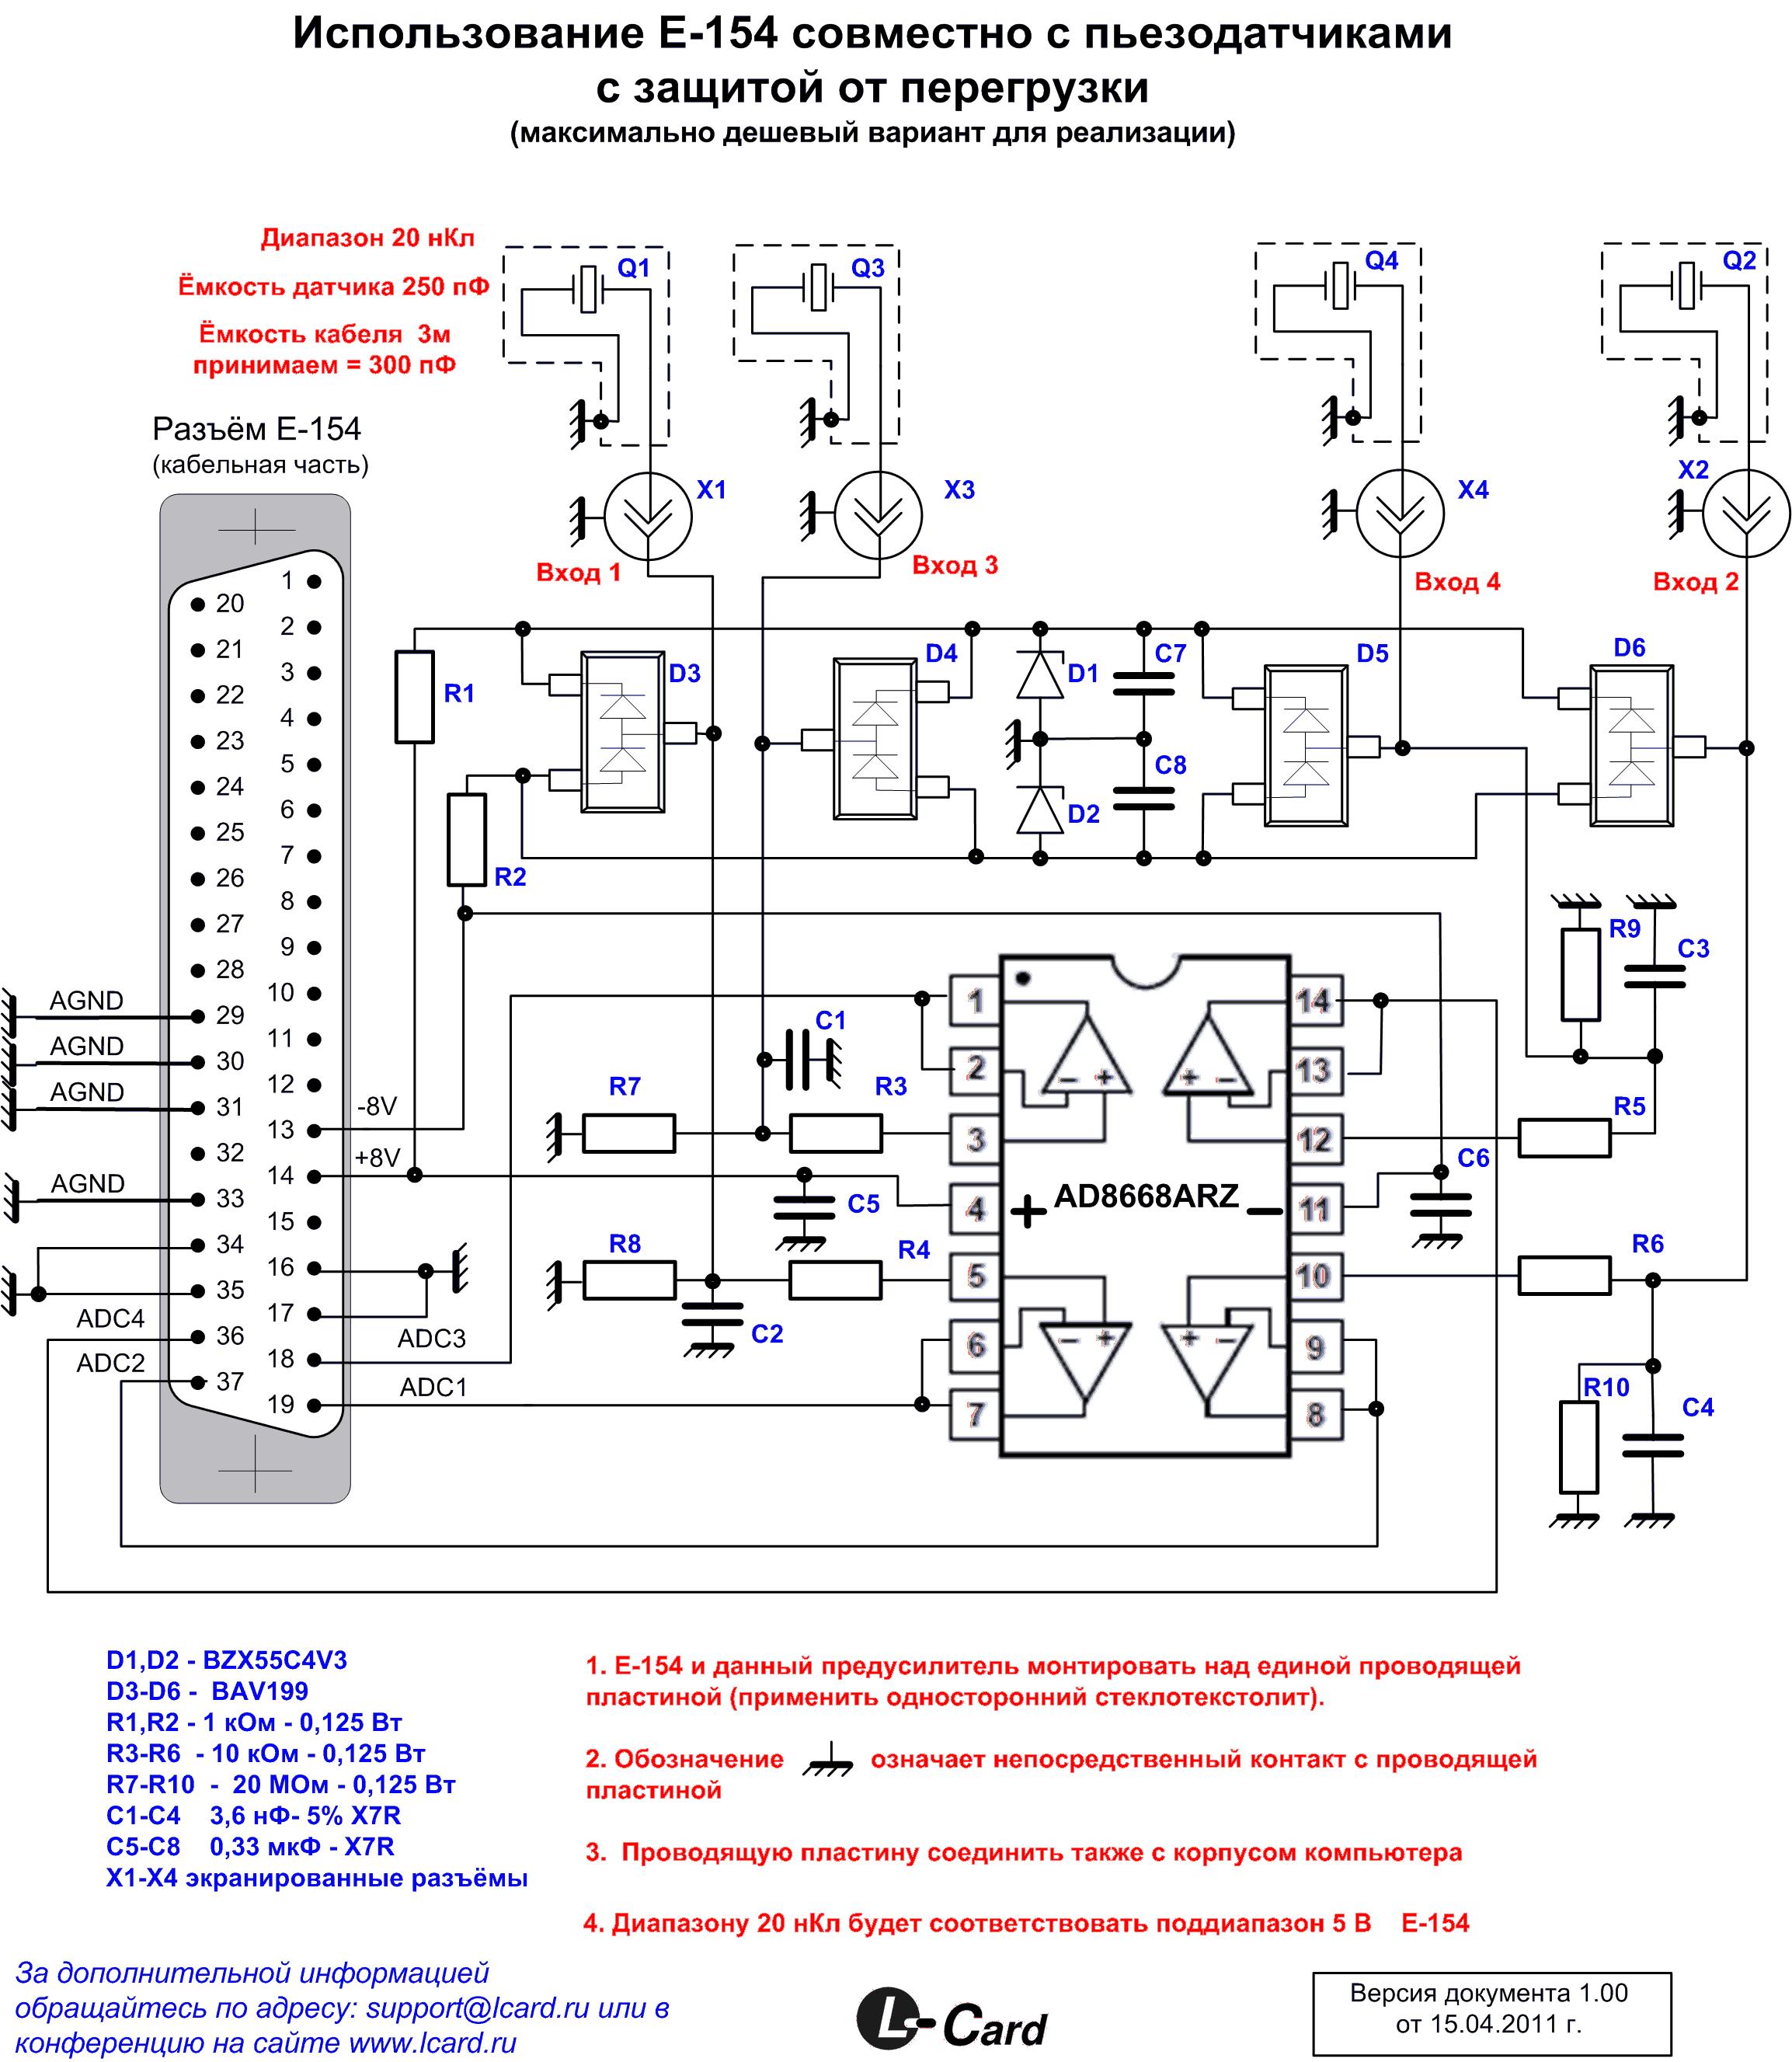 E-154 c пьезодатчиком